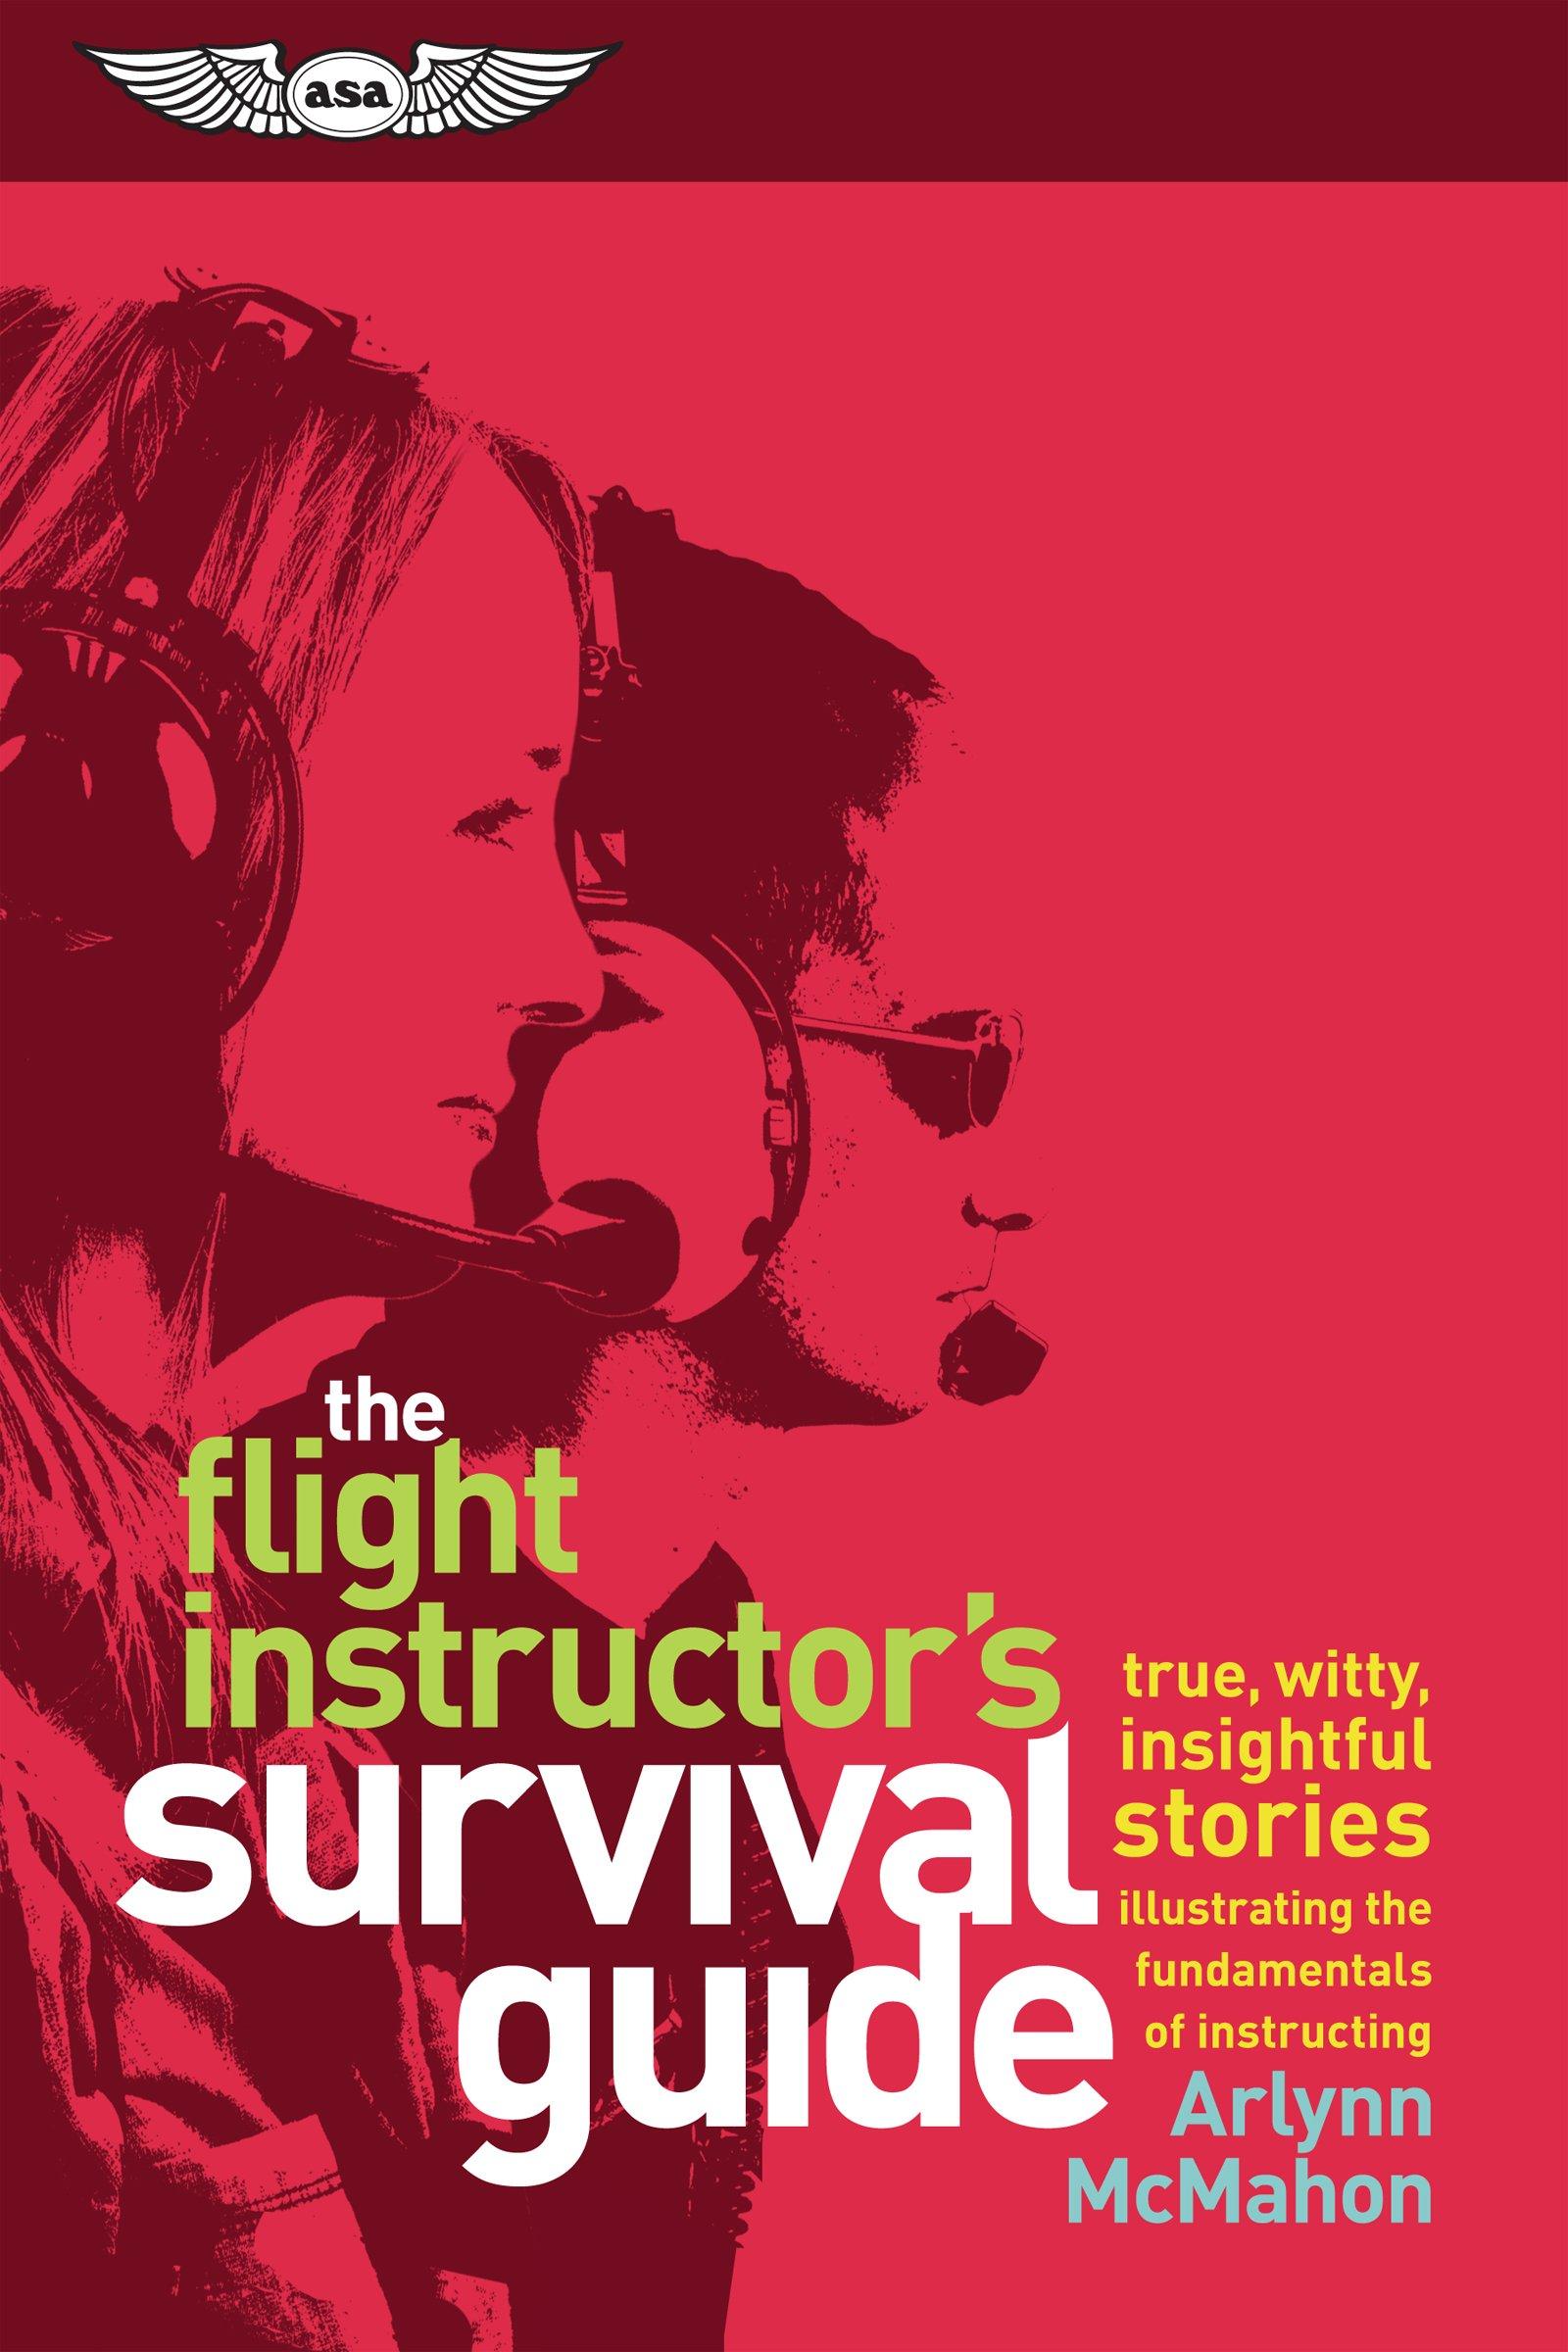 84b1a74d5d1 The Flight Instructor s Survival Guide  true